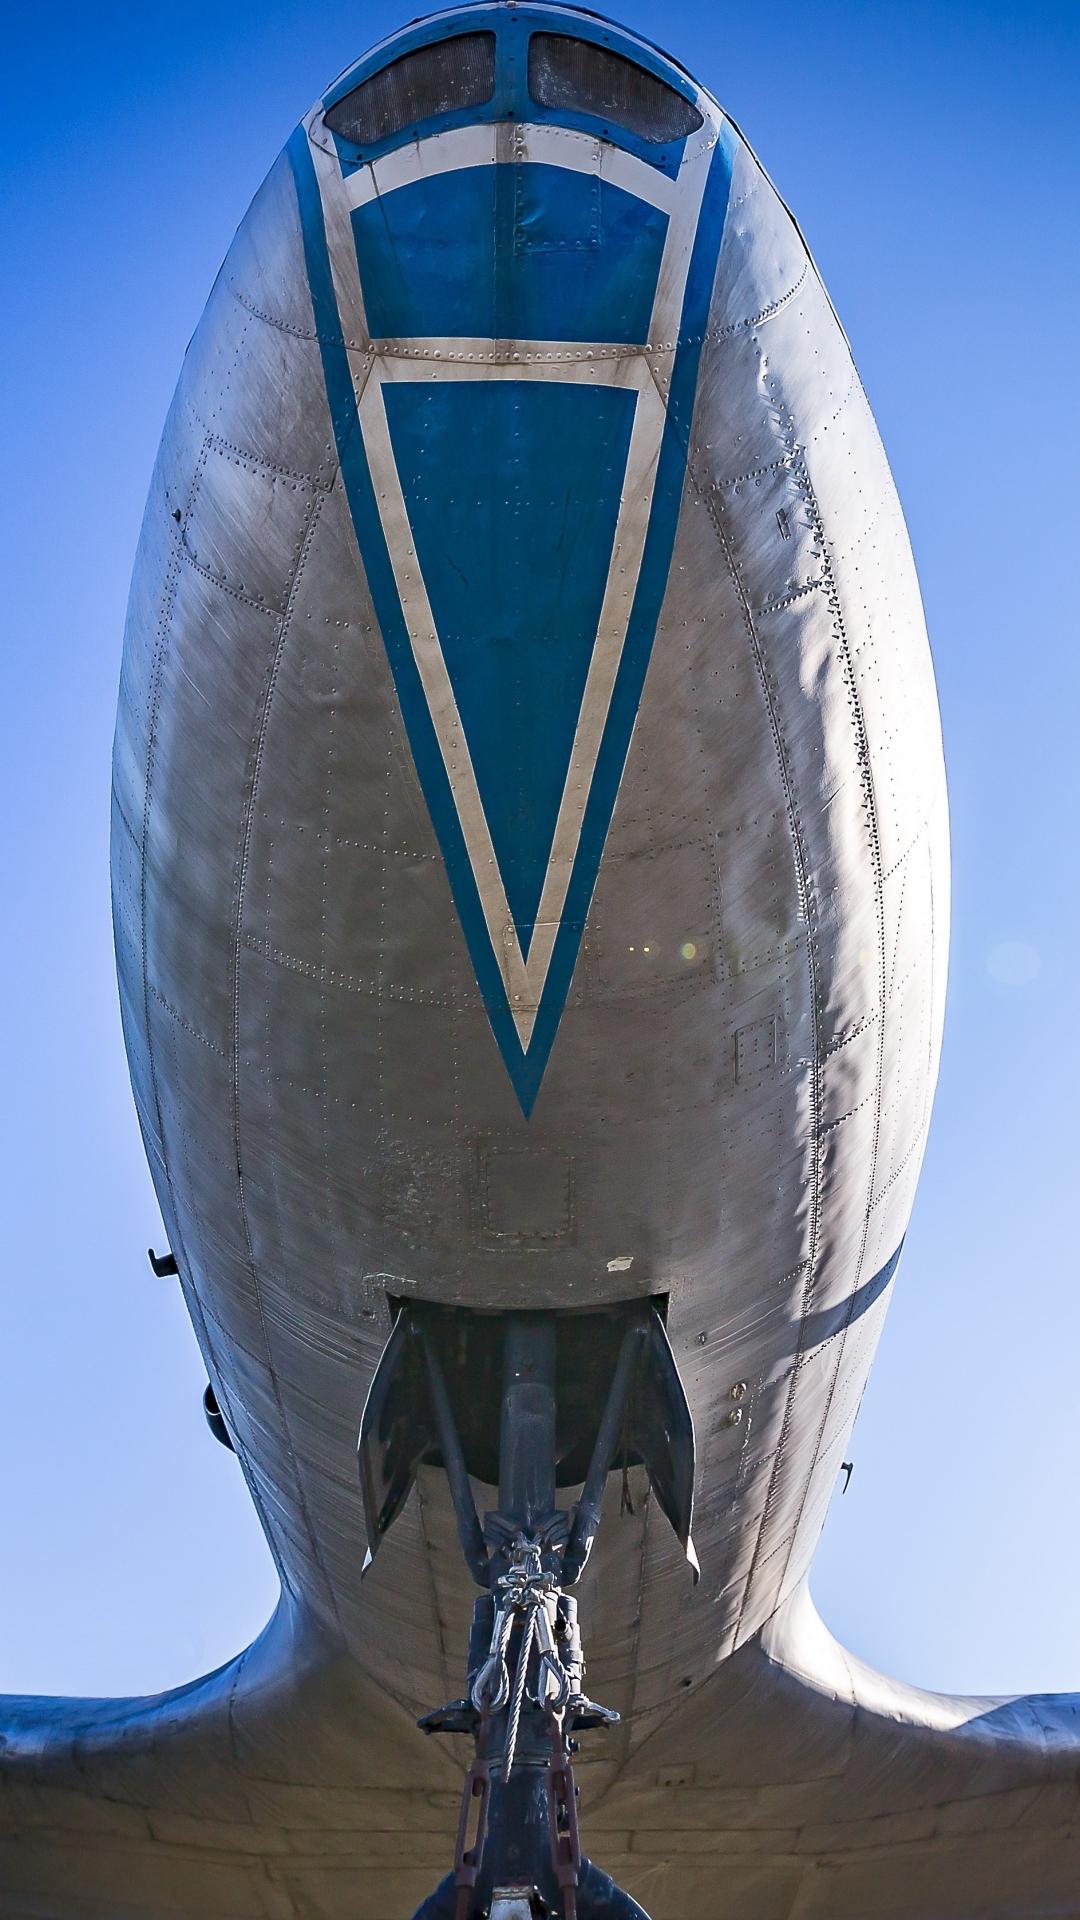 Download 1080x1920 Wallpaper Aircraft Airplane Bottom Samsung